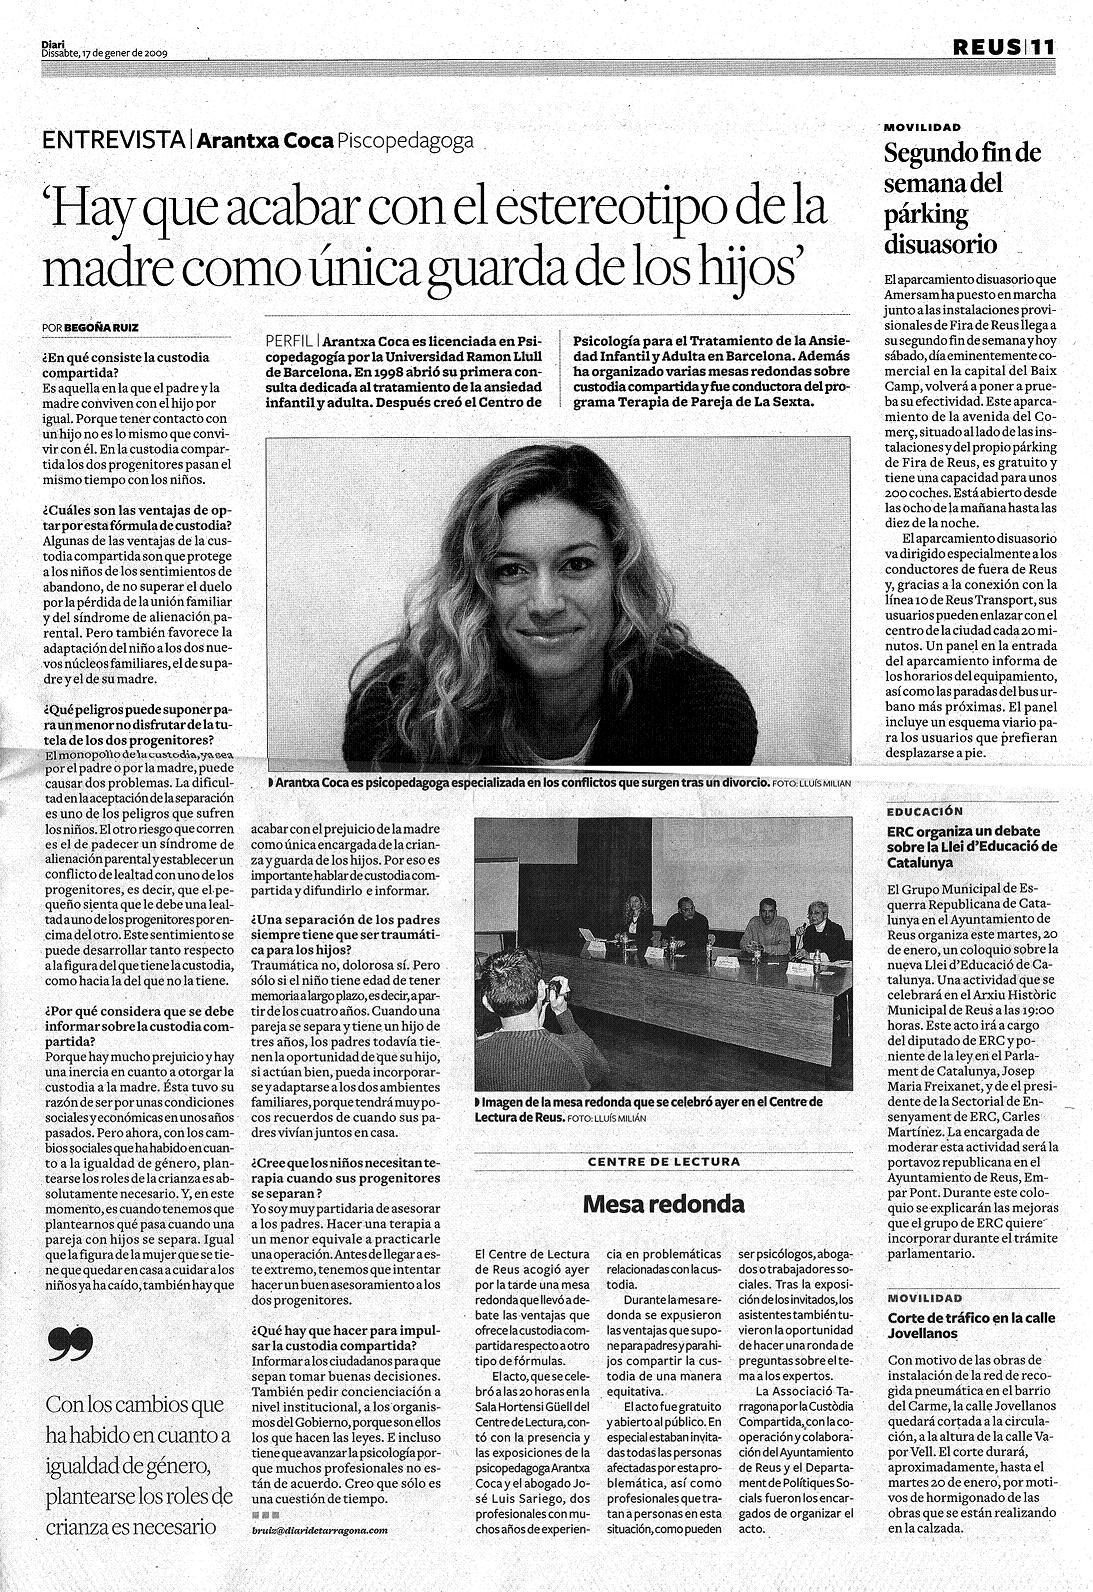 estructura entrevista: